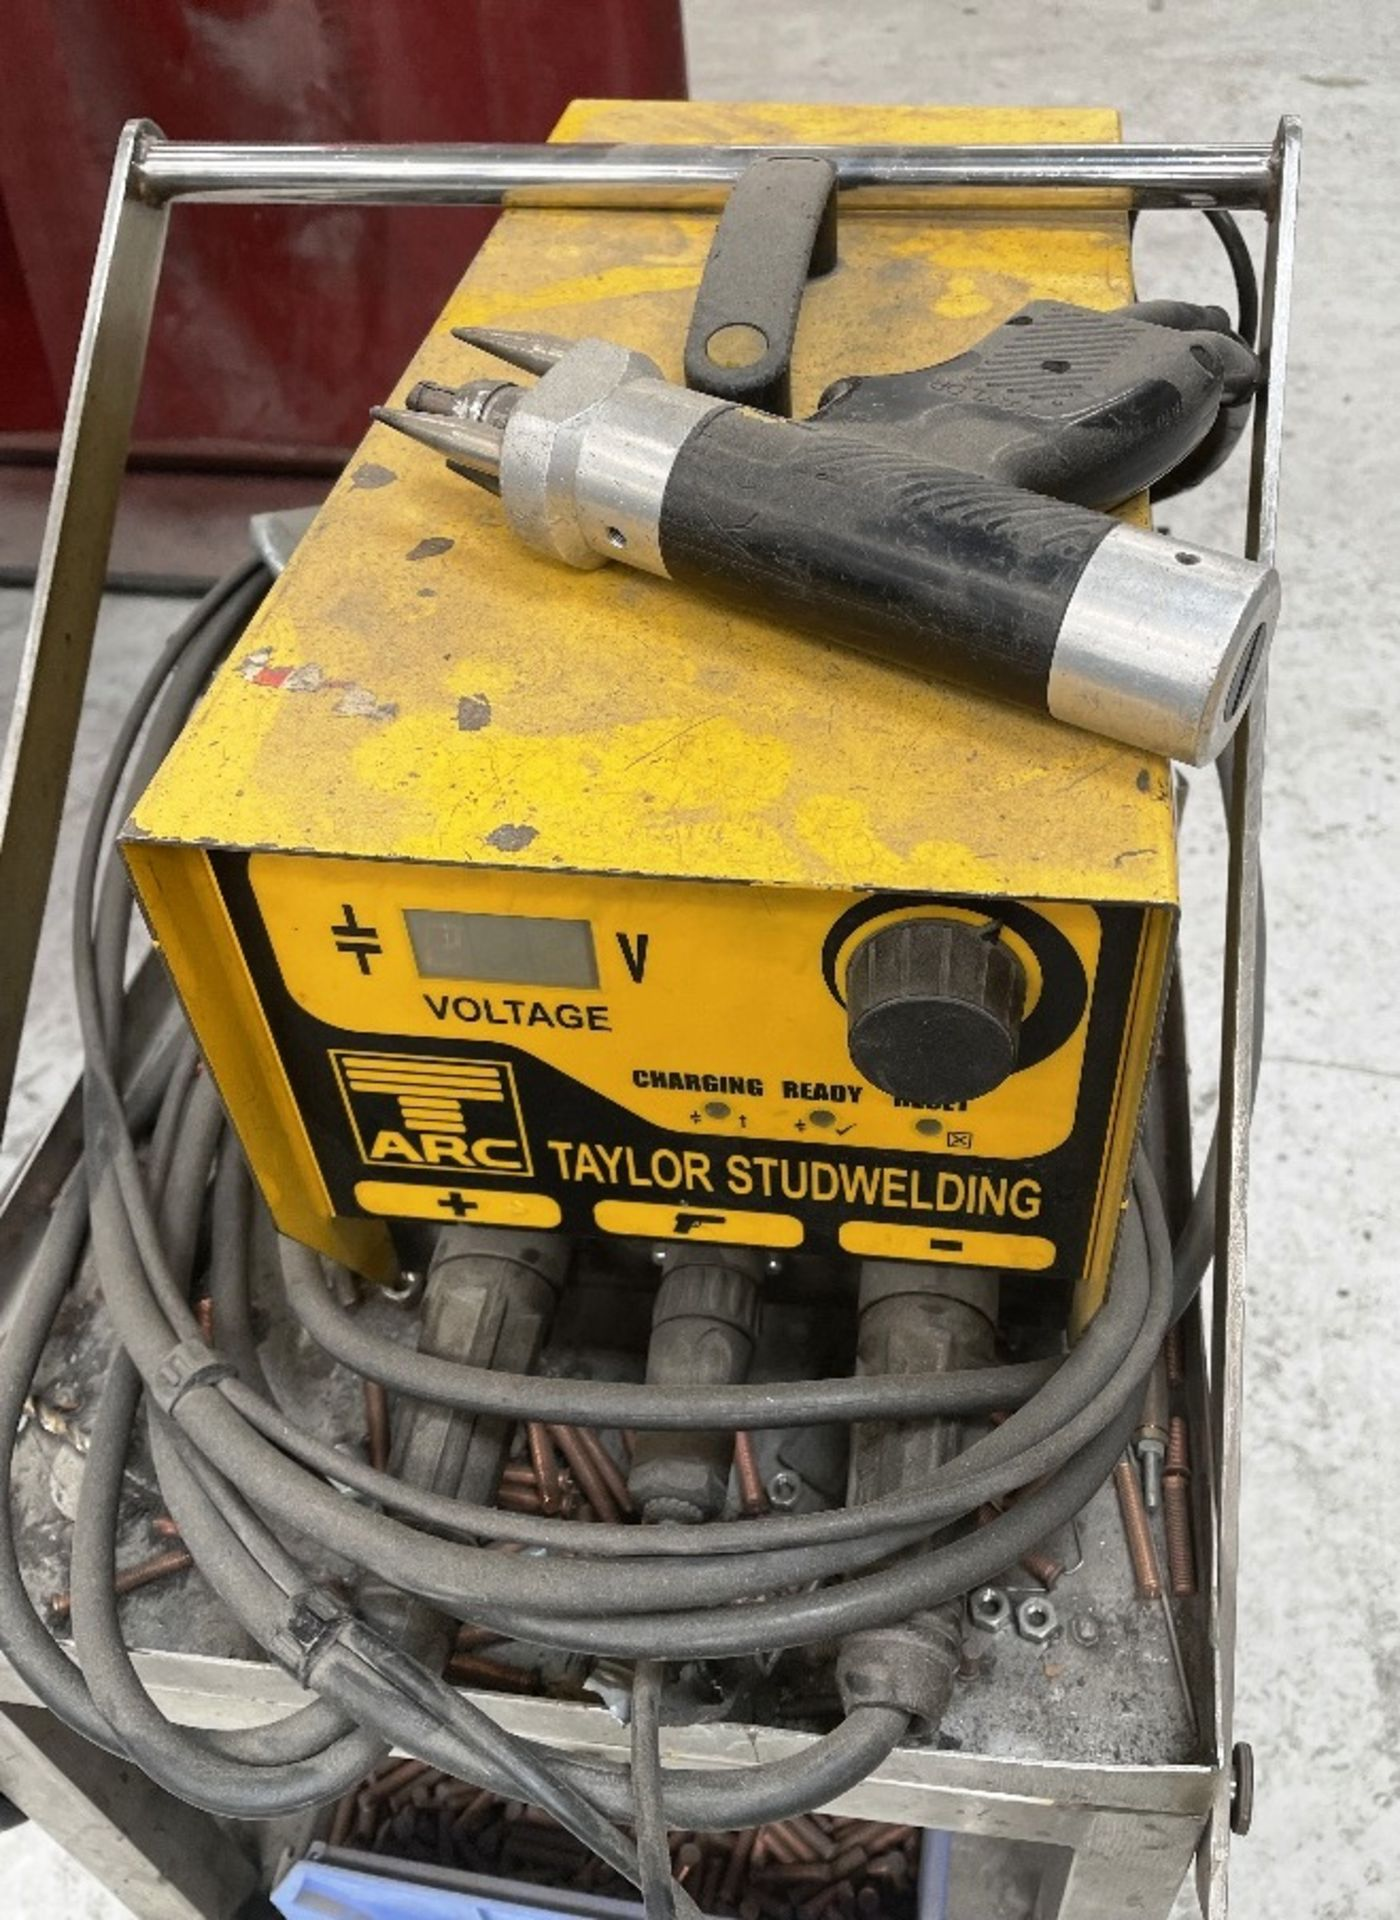 Taylor CDM8 Capacitor Discharge Stud Welding Machine w/ Gun, Studs & Mobile Bench - Image 2 of 5